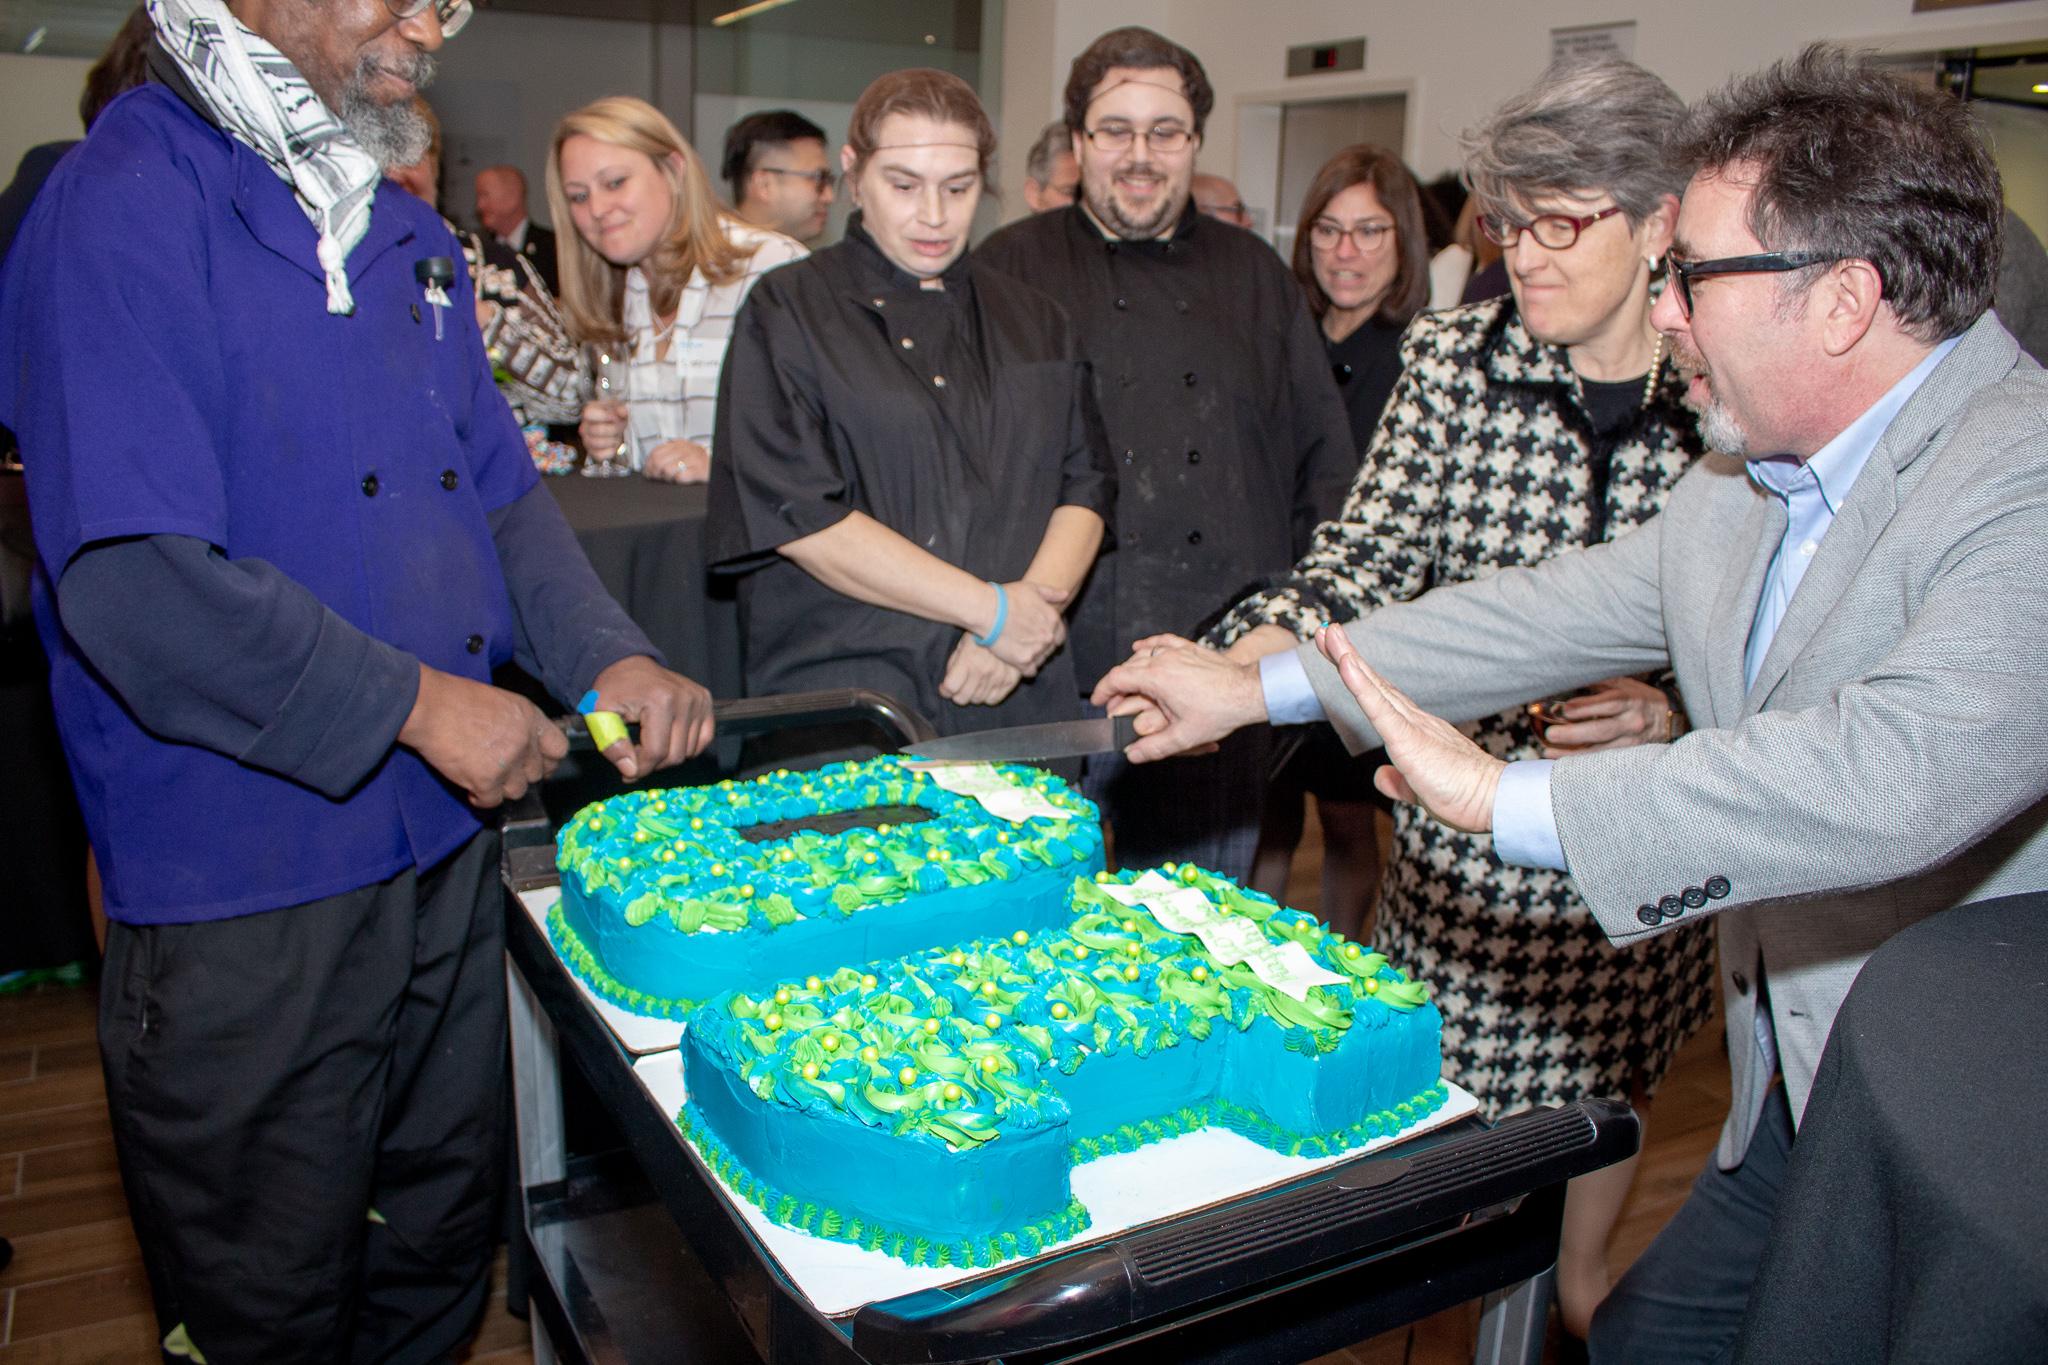 20 Chris McMahon Cake Will Edwards